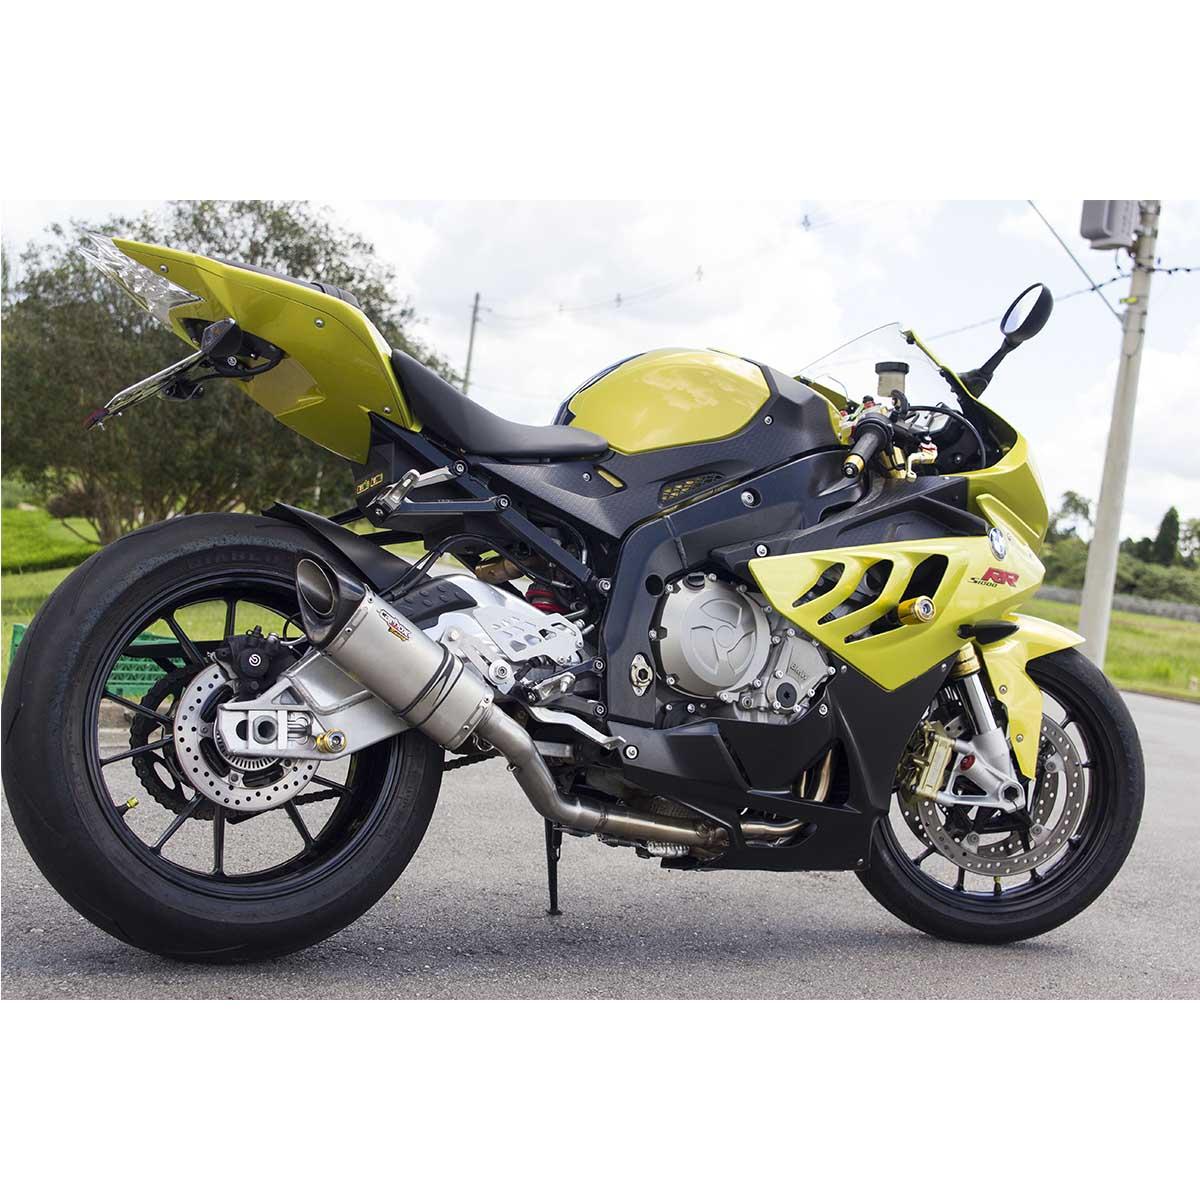 Escapamento Full 4x2x1 Scorpion S725 Inox p/ BMW S1000RR até 2015